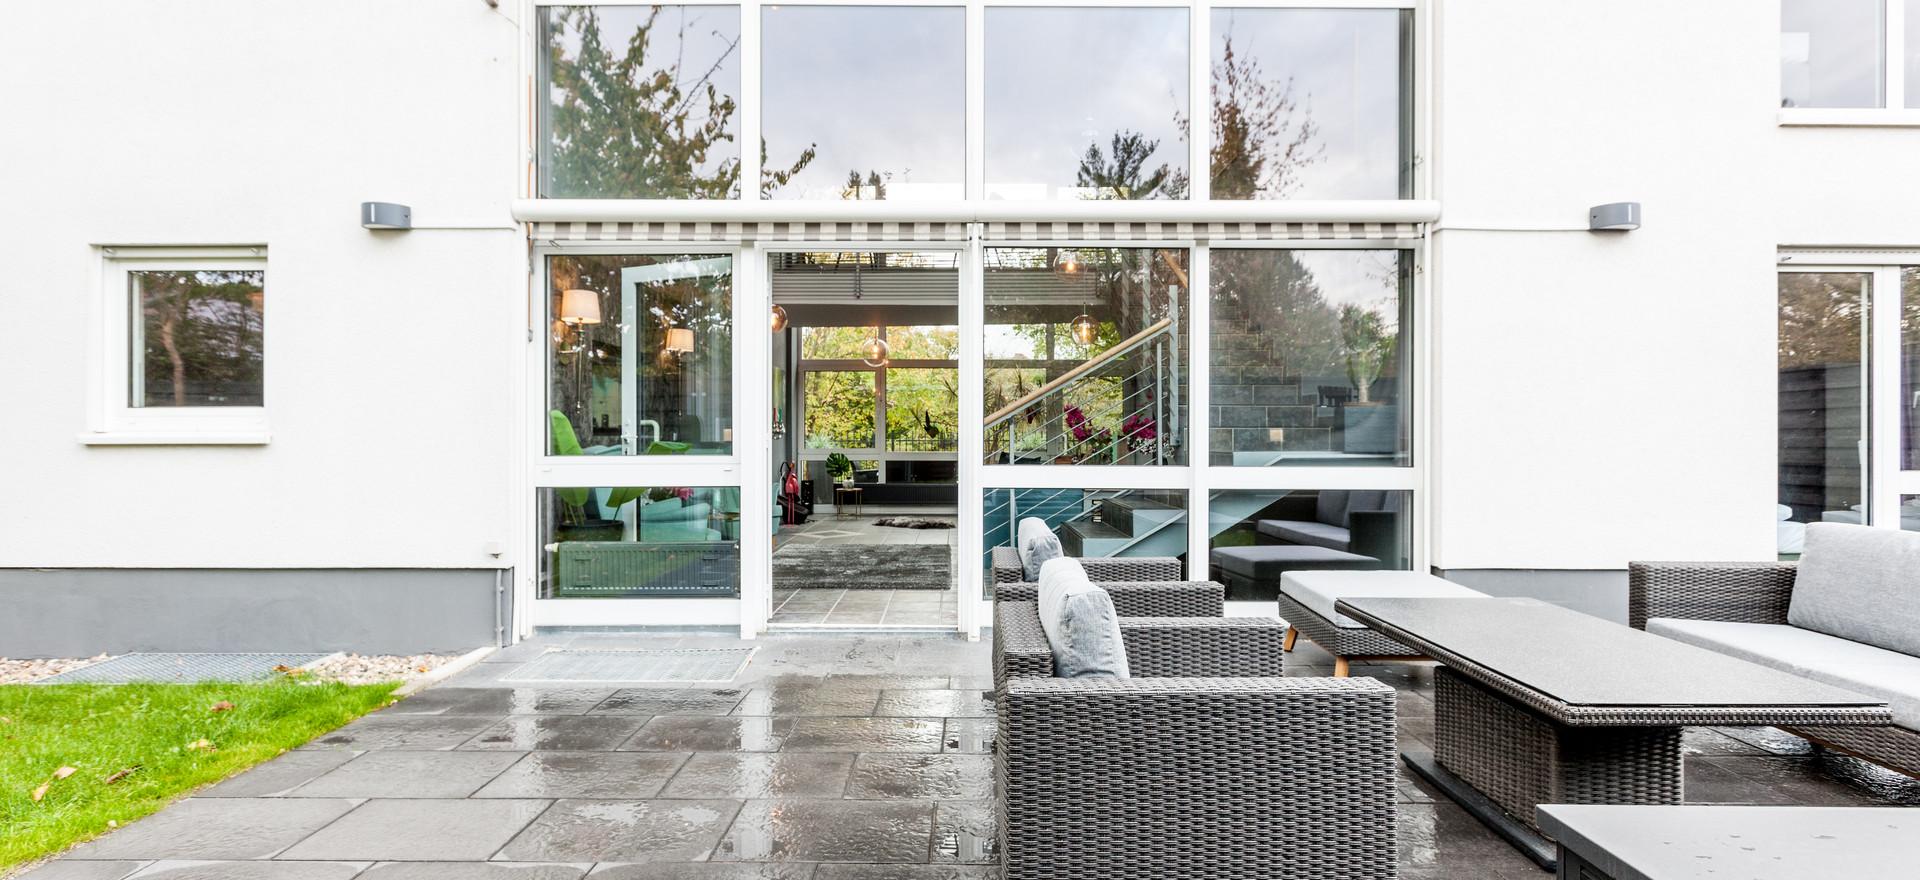 Garten (Terrasse & Hintereingang)